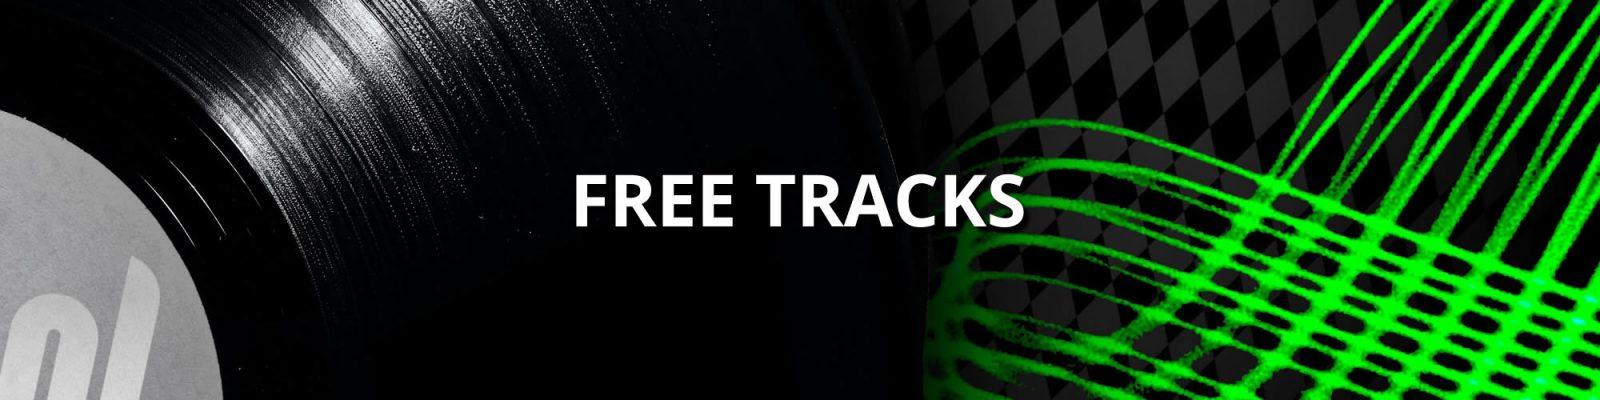 Free Drum & Bass Tracks by Mr Nitro